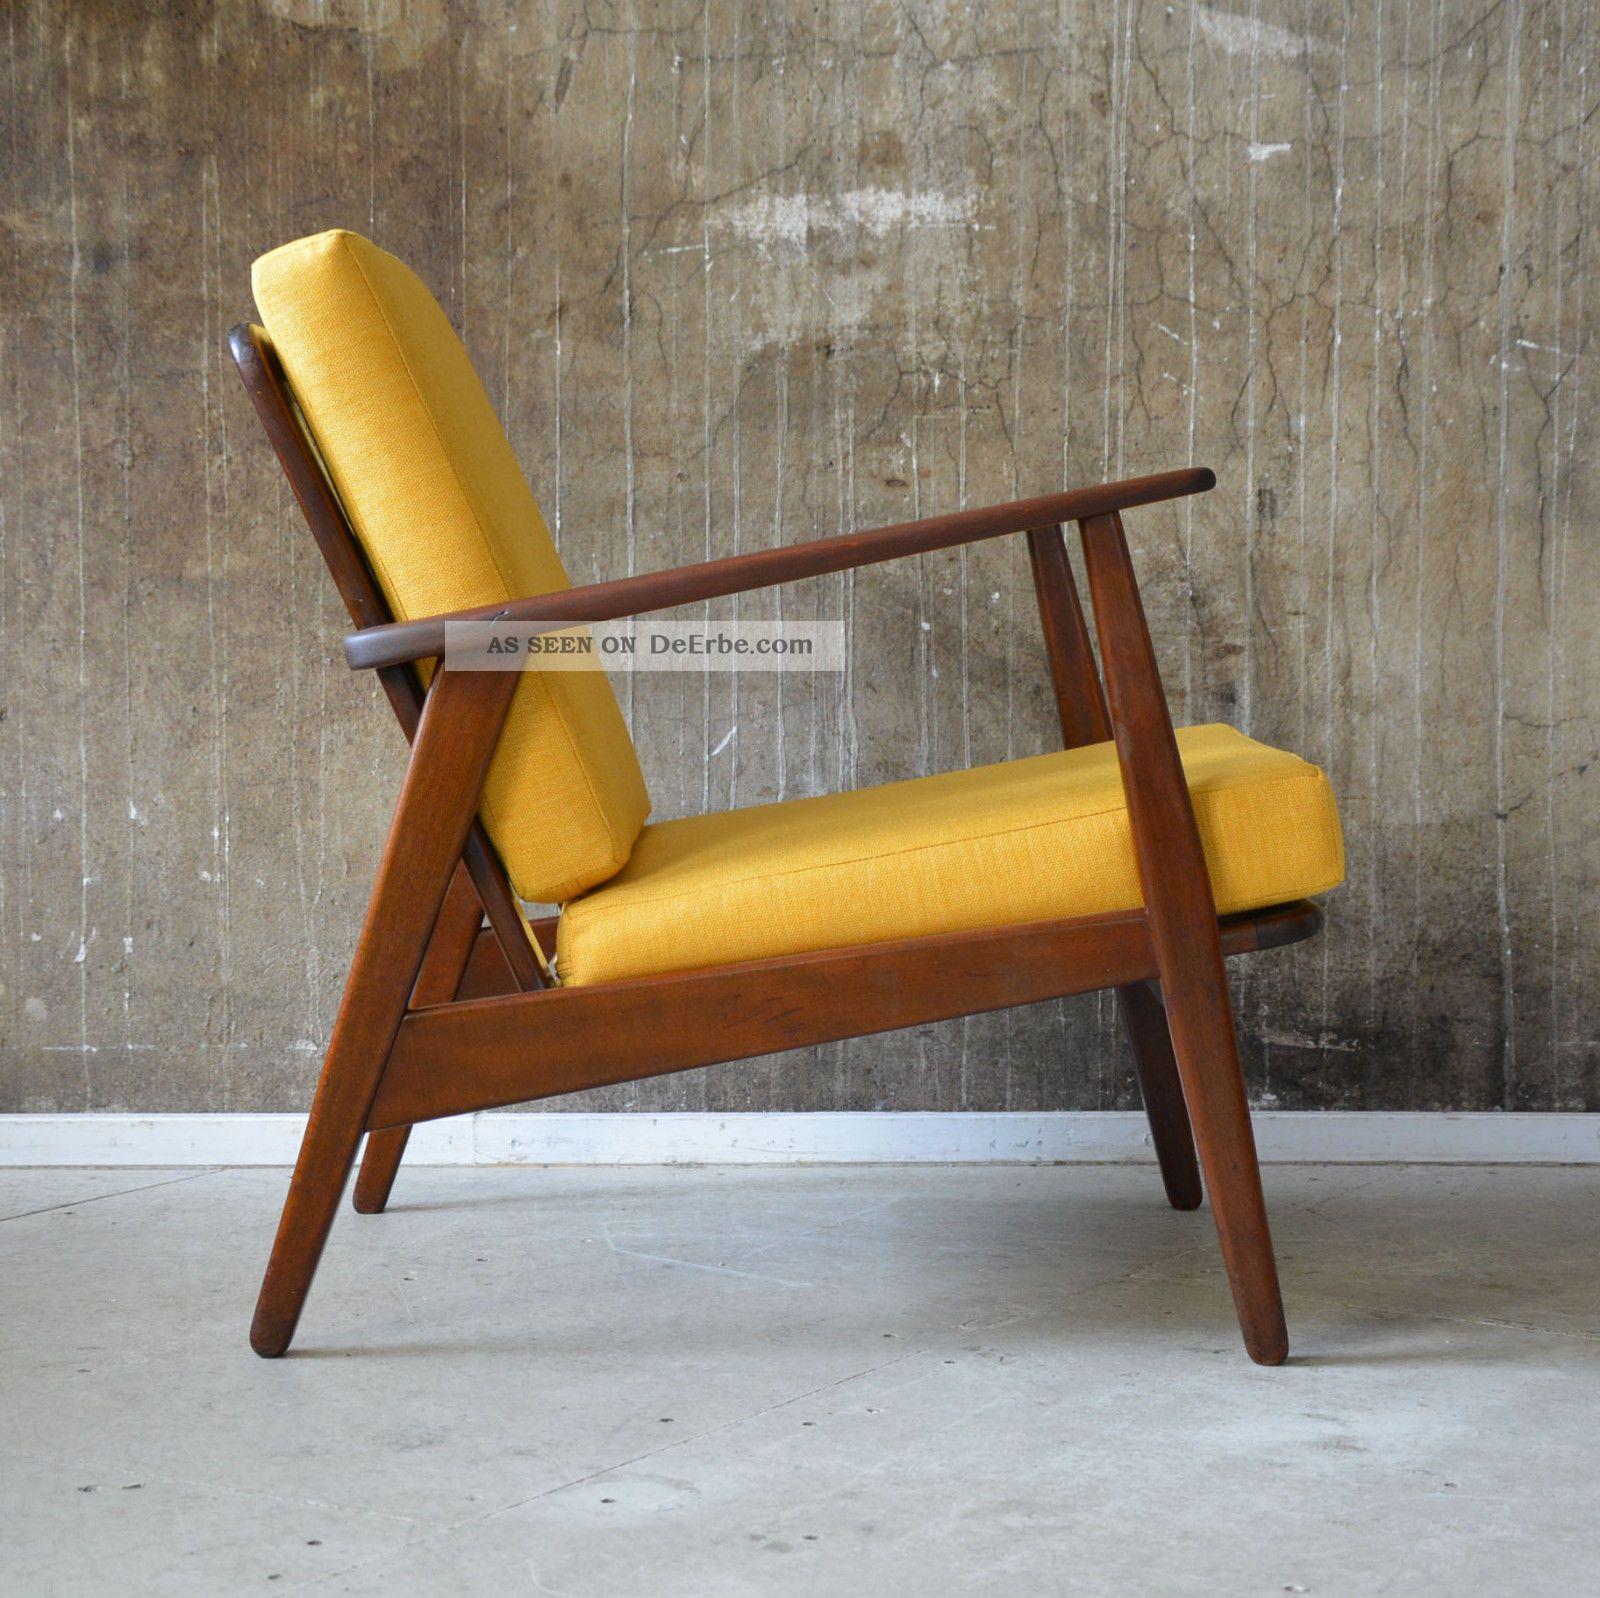 Design Stil 1960 1969 Mobiliar Interieur Antiquitäten